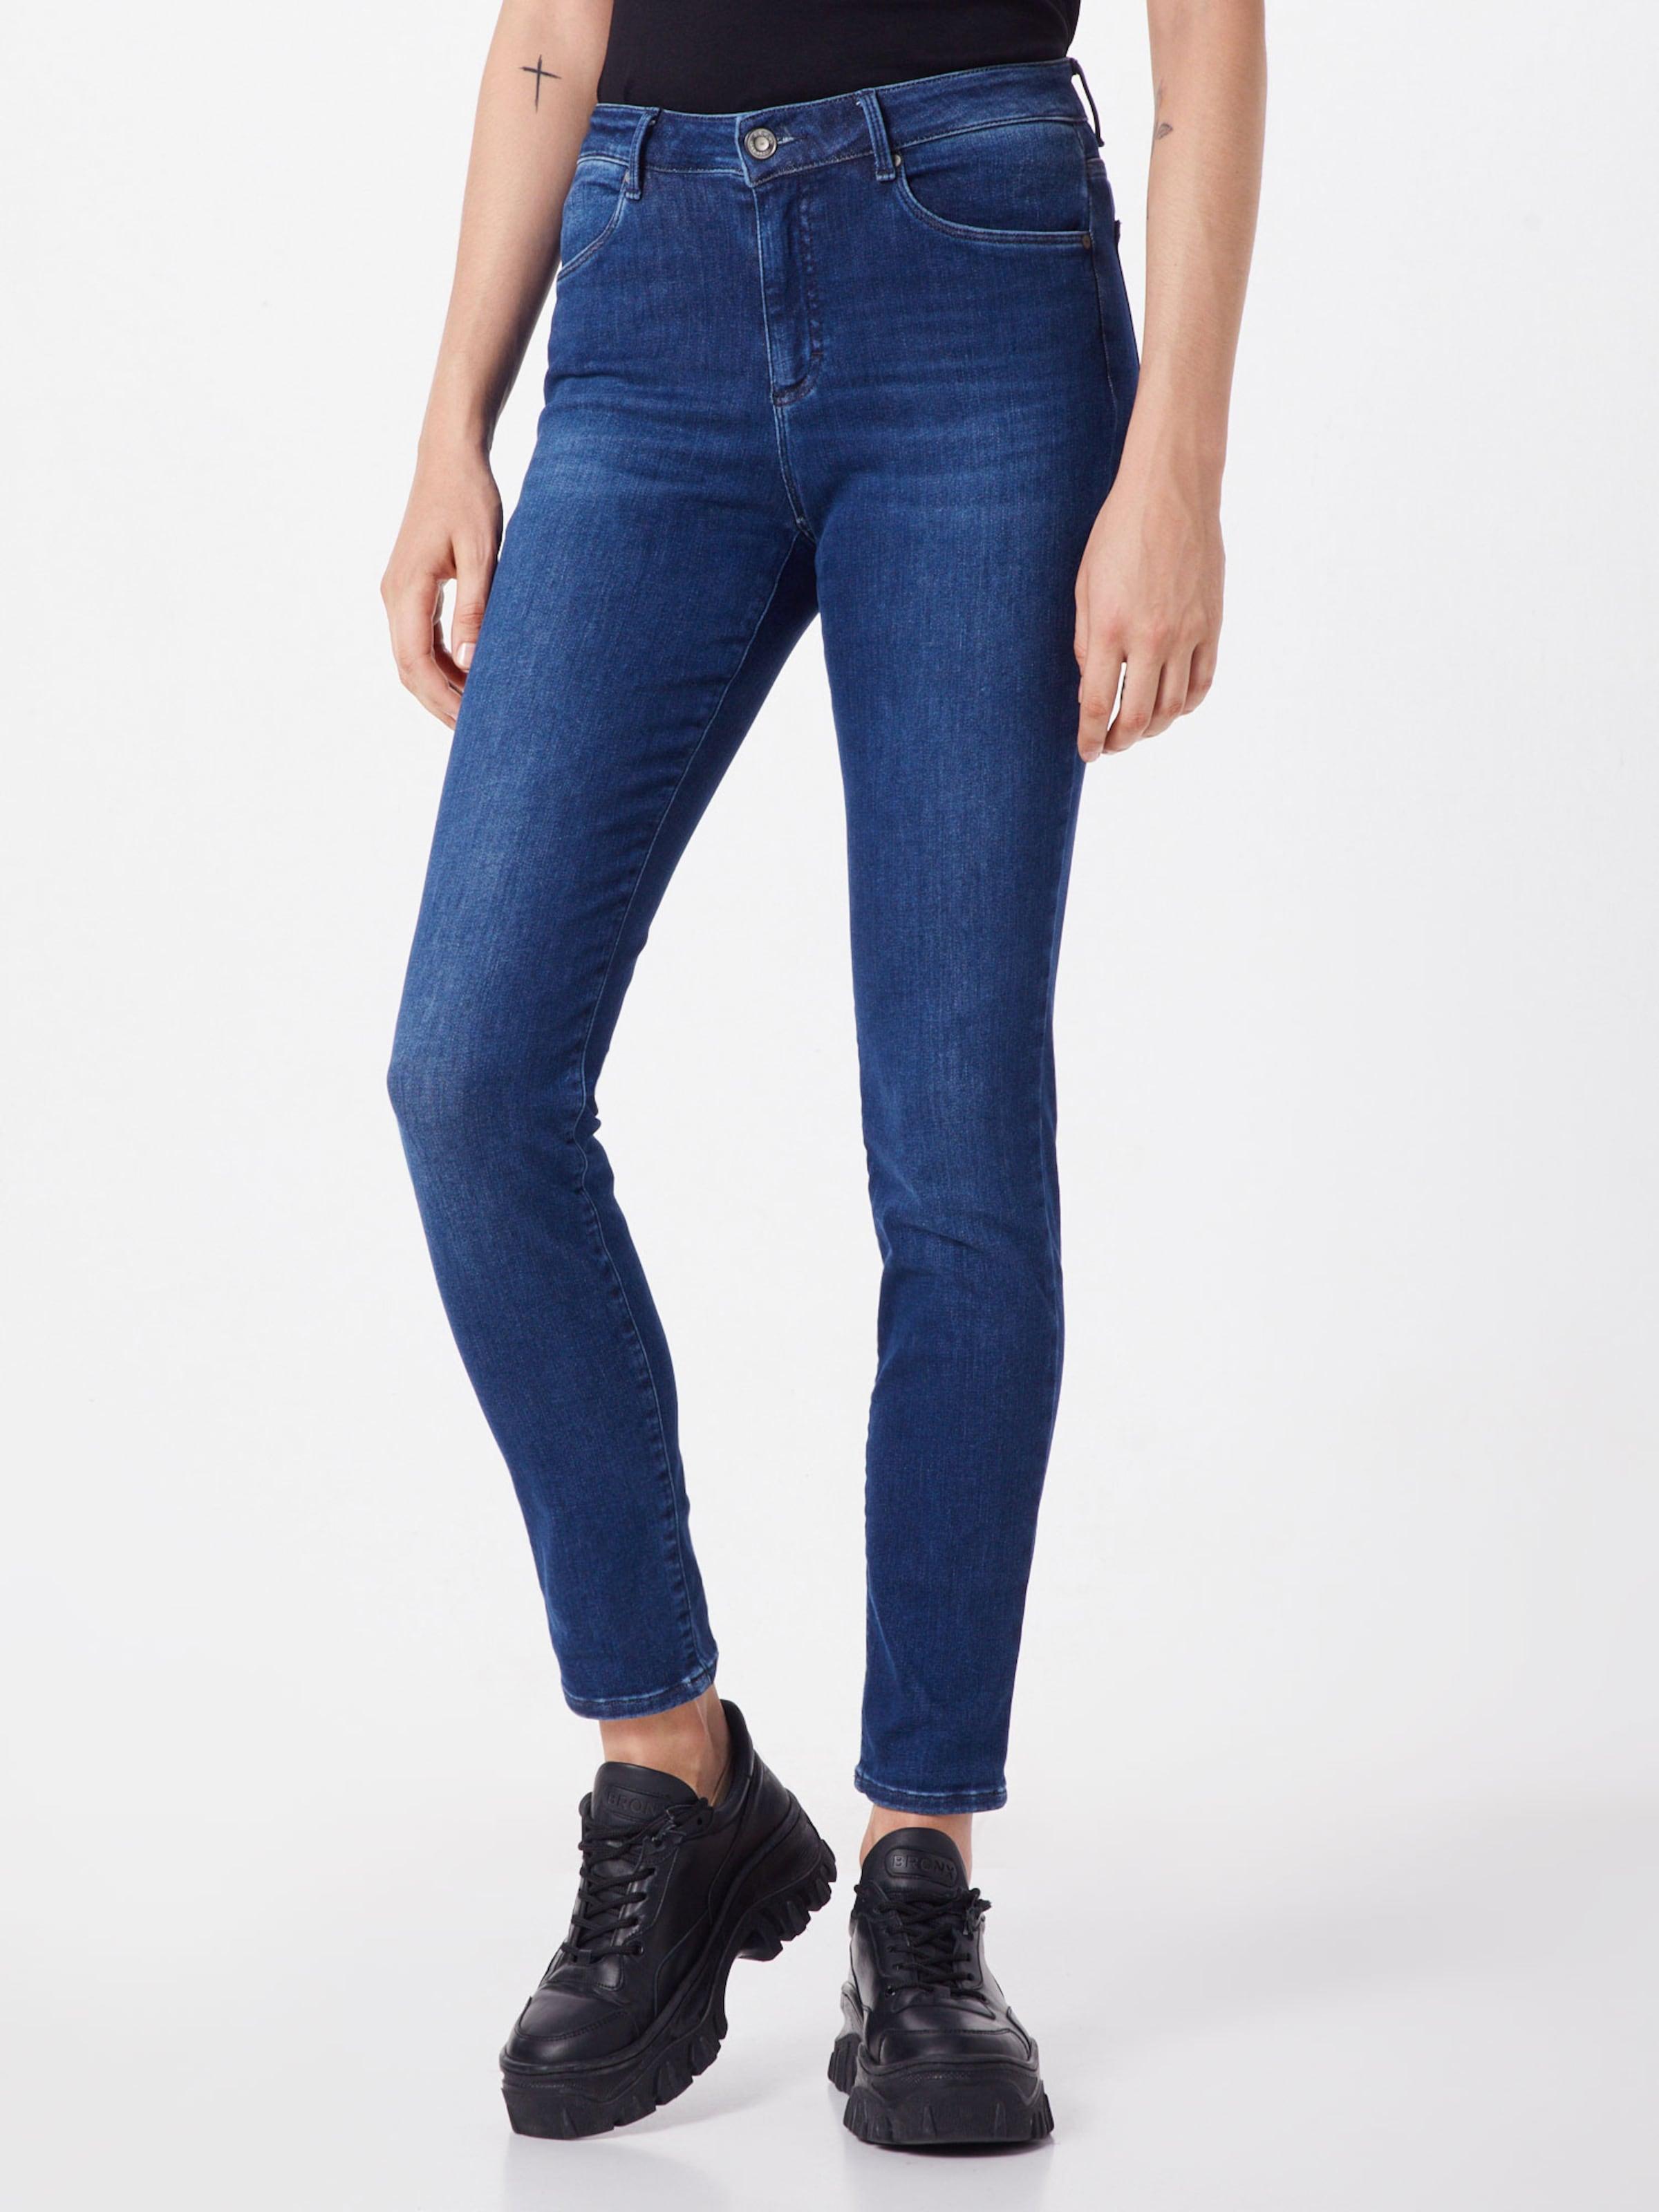 Blue In Denim 'shakira' Jeans Brax KcTJlF1